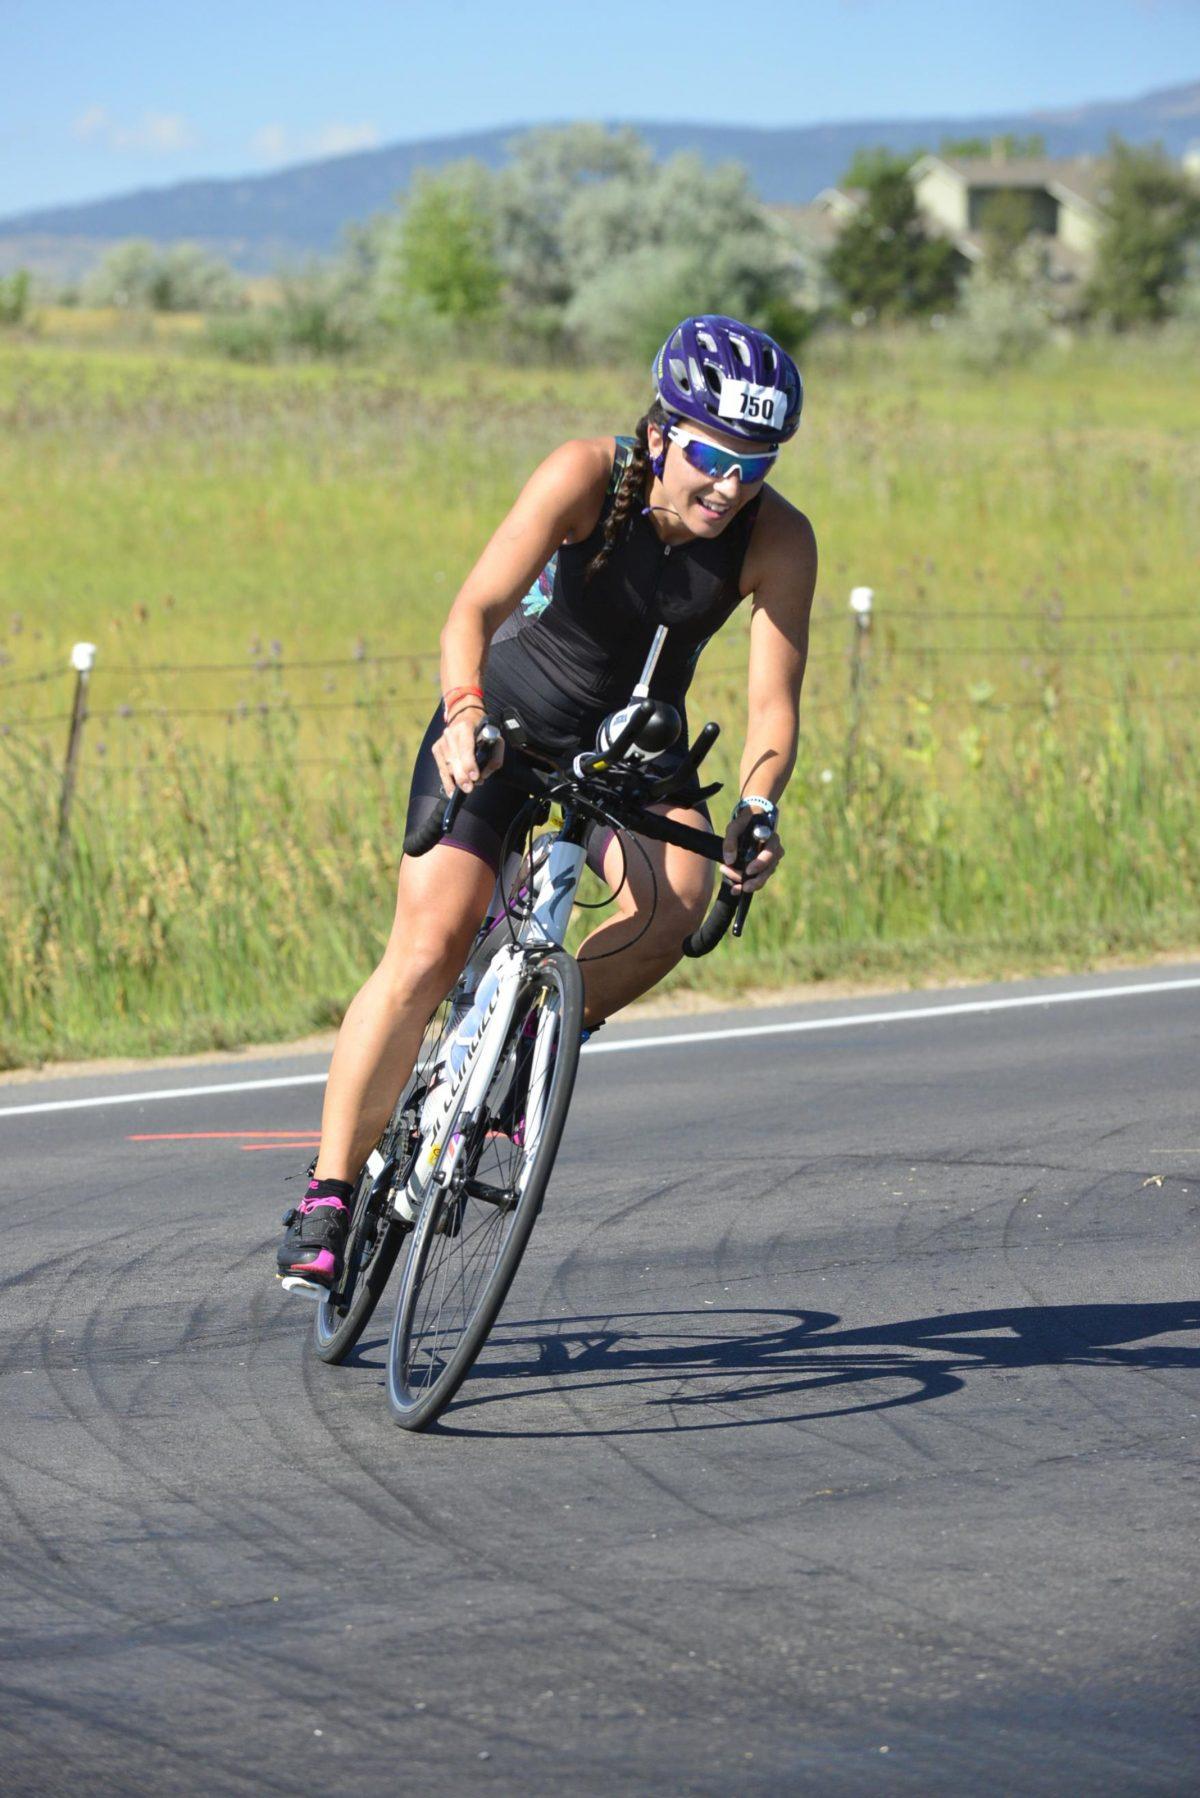 rower pierwszy ironman boulder usa